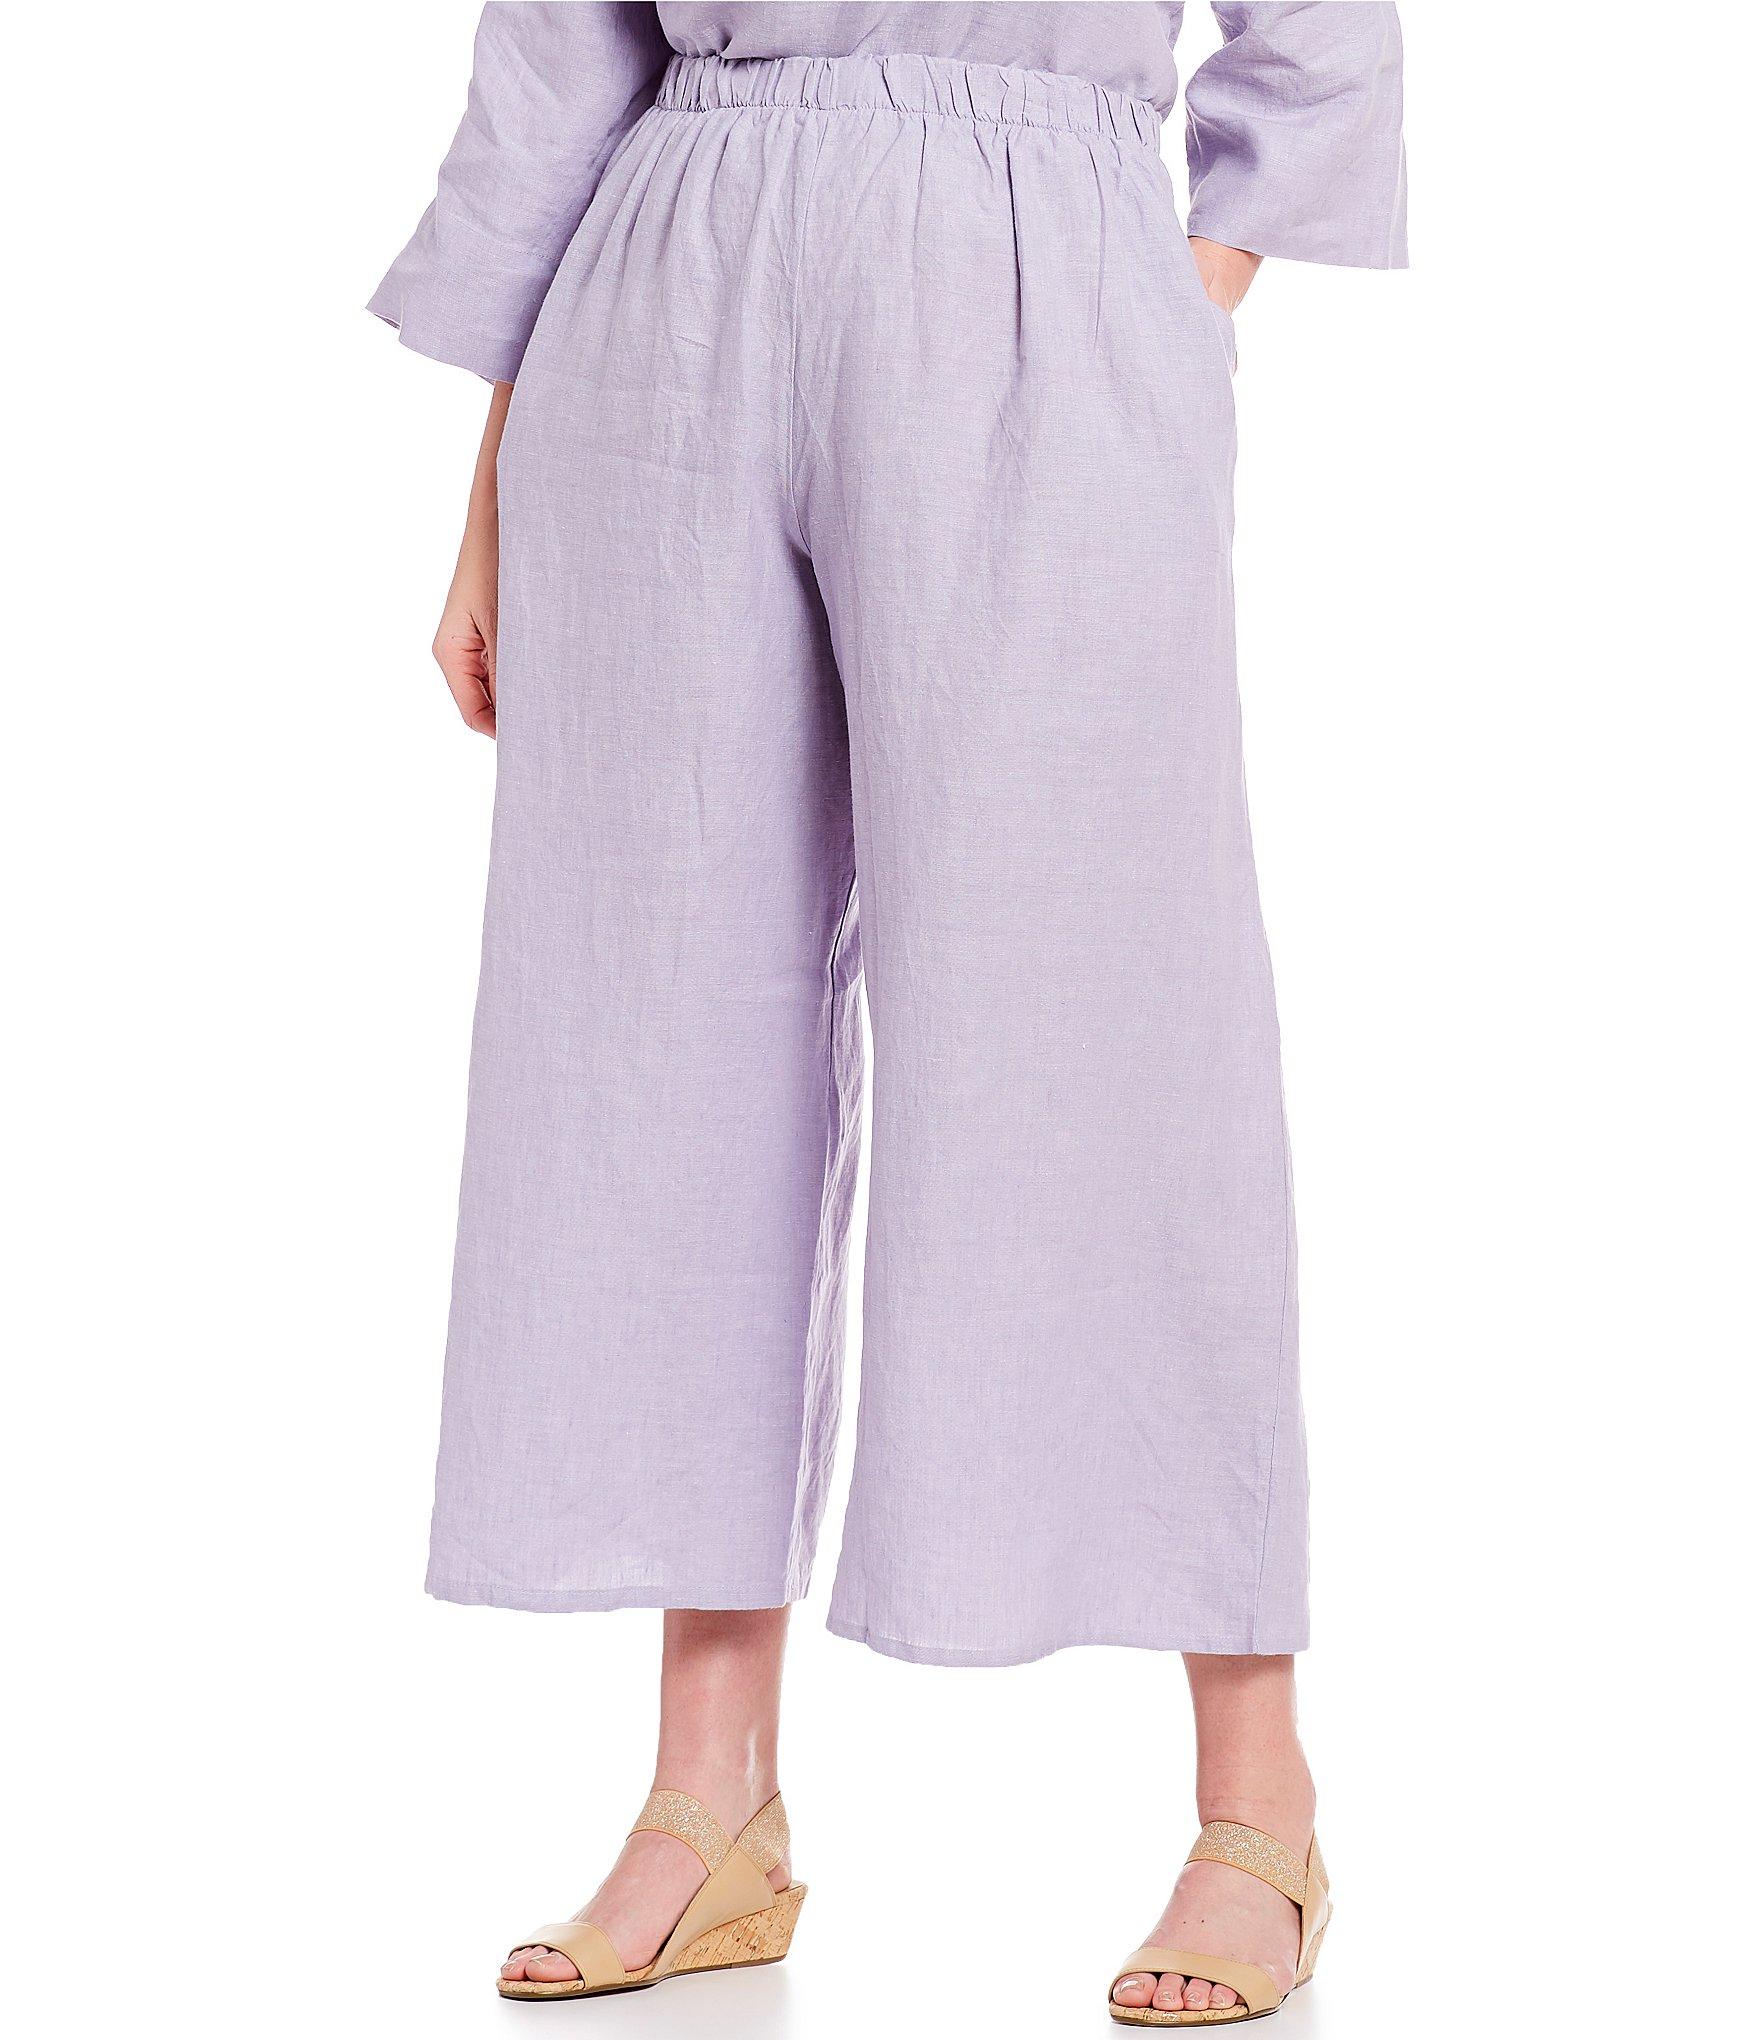 640437cd03b Bryn Walker Plus Size Capri   Cropped Pants